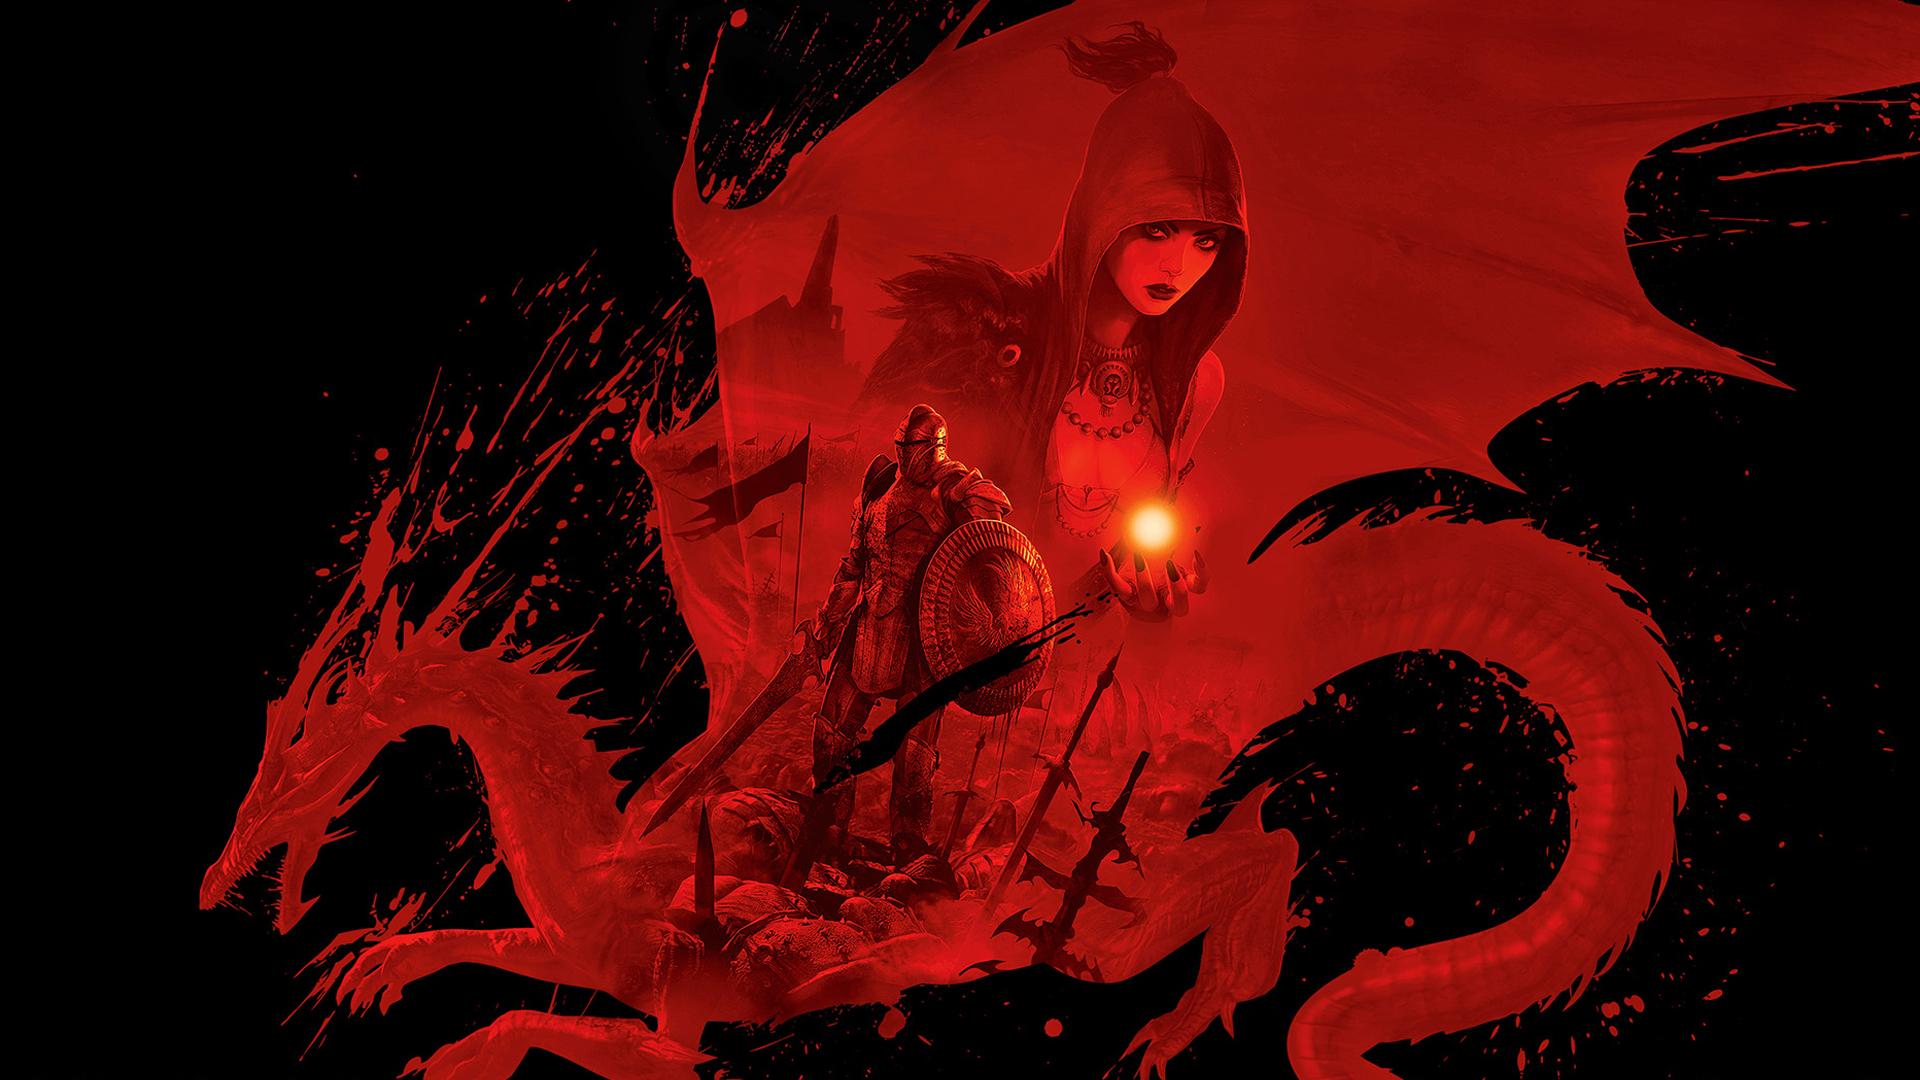 49 Dragon Age Wallpaper Hd On Wallpapersafari